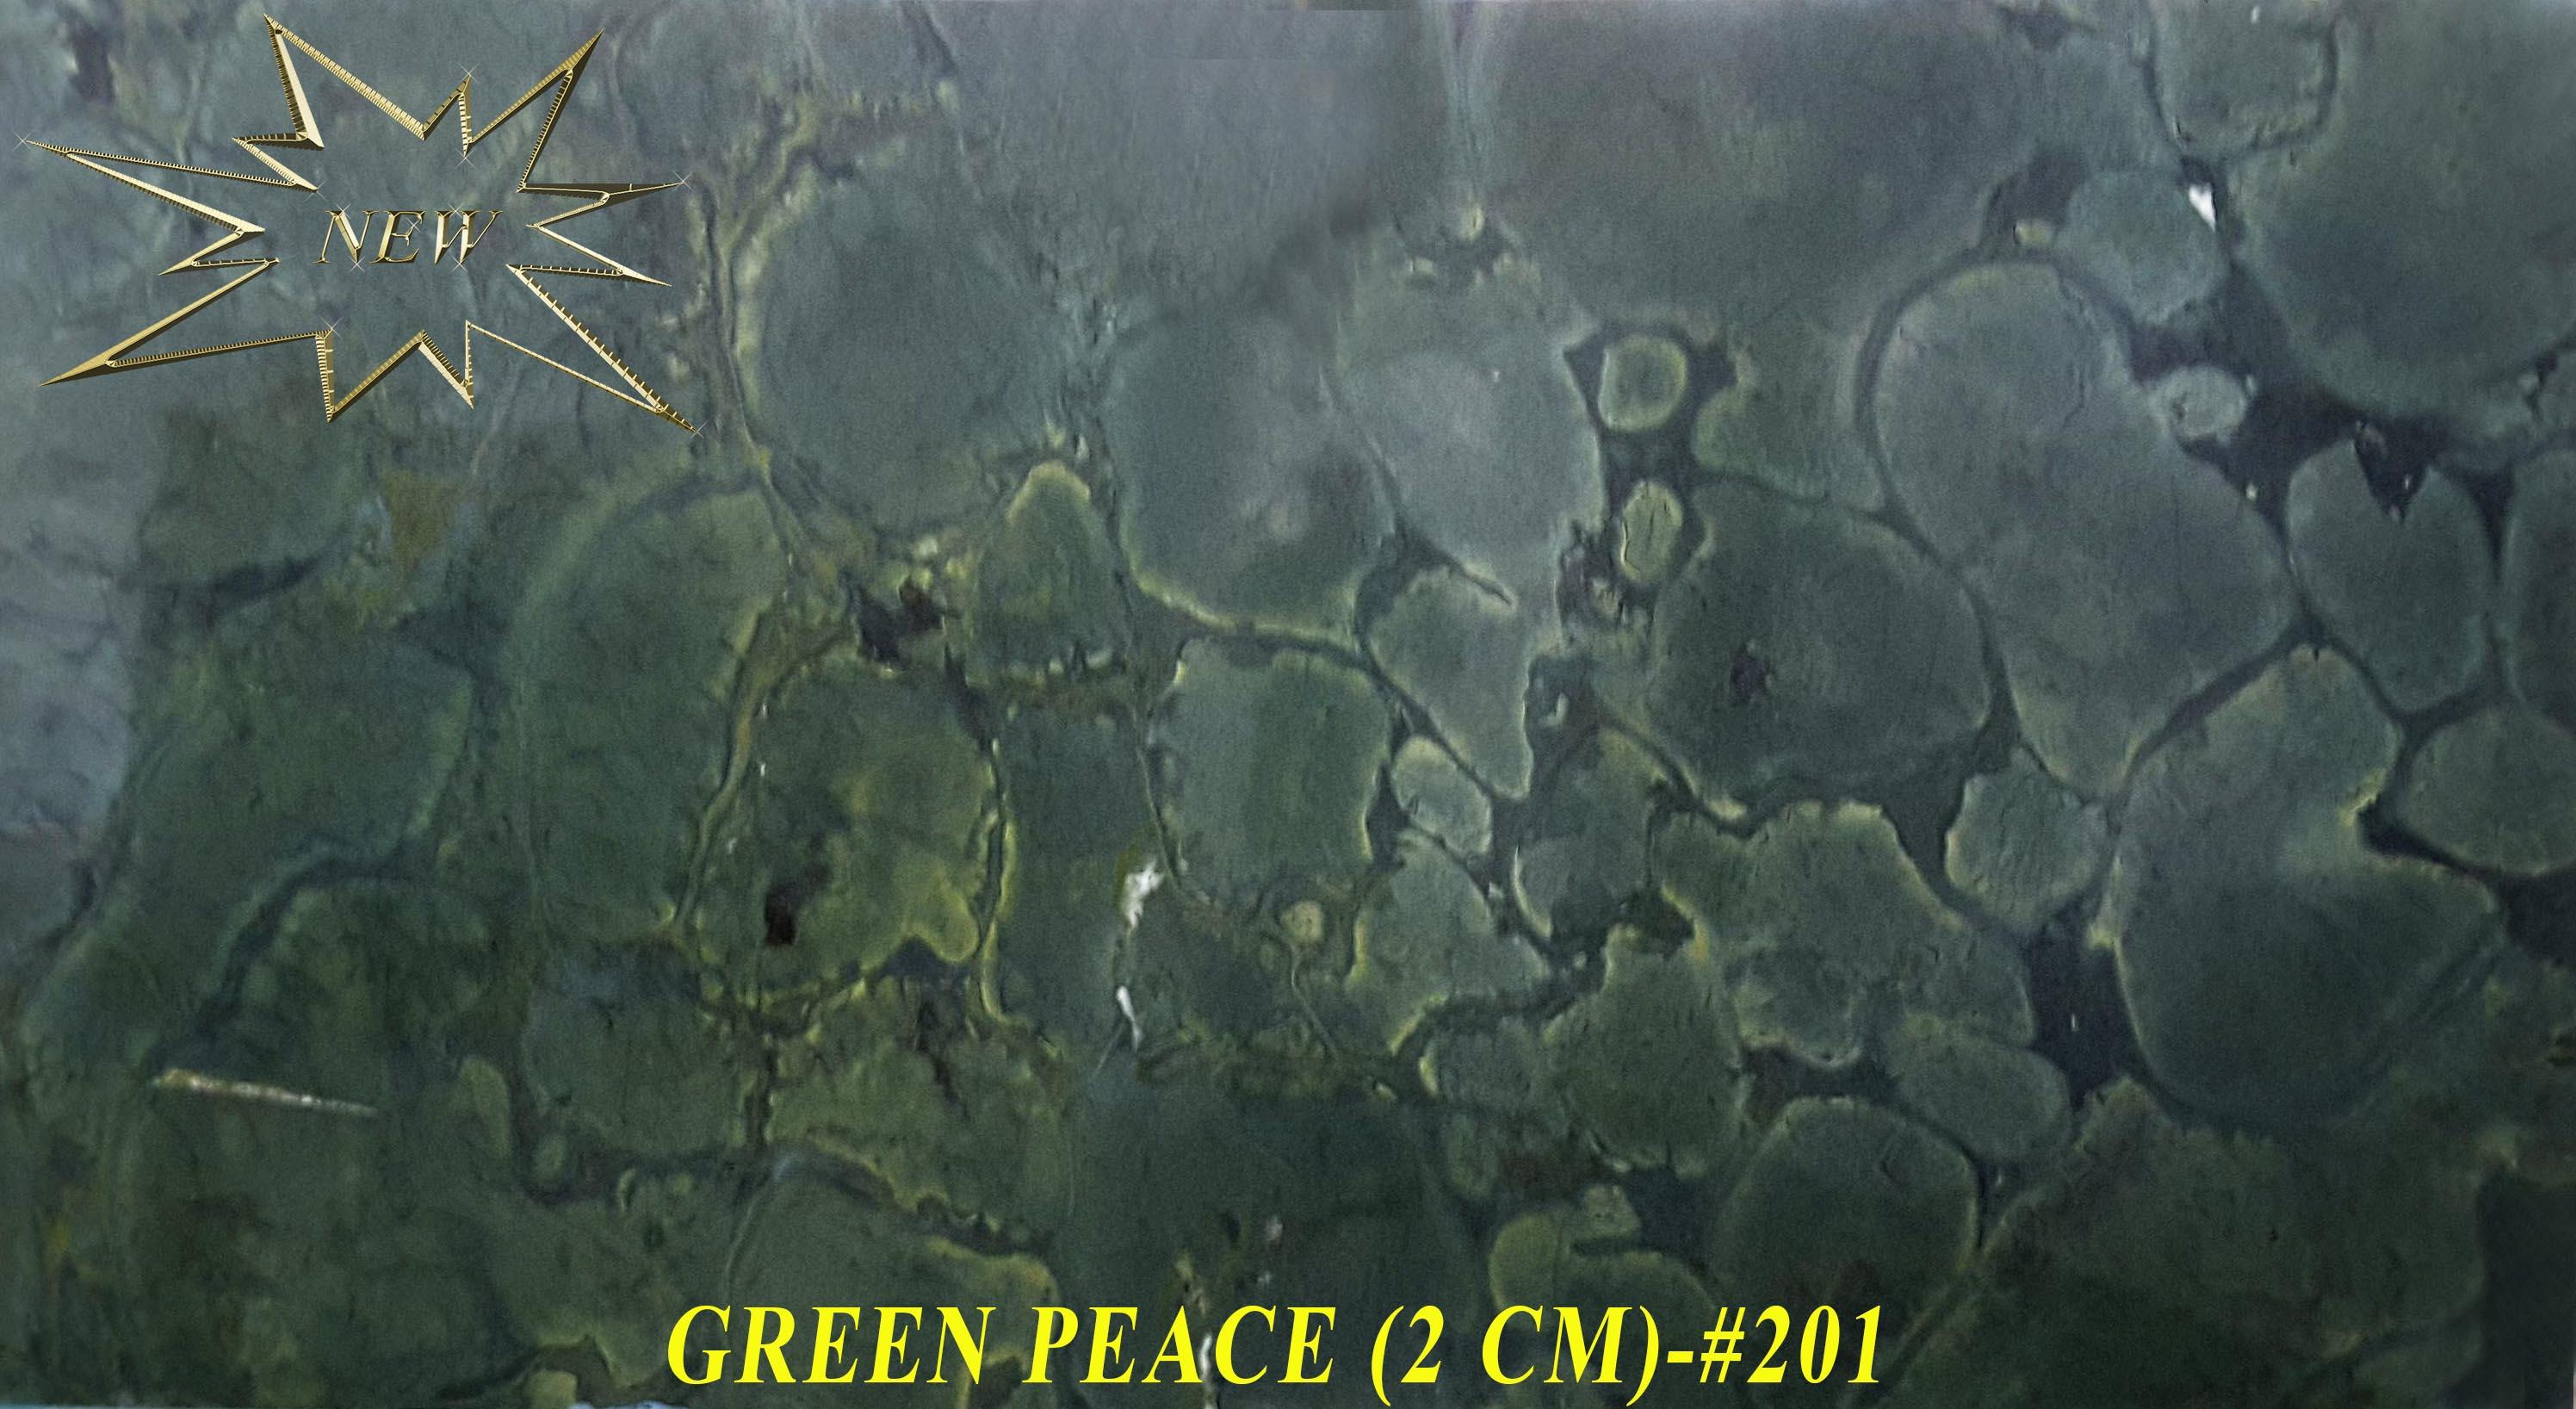 GREEN PEACE (2 CM)-#201